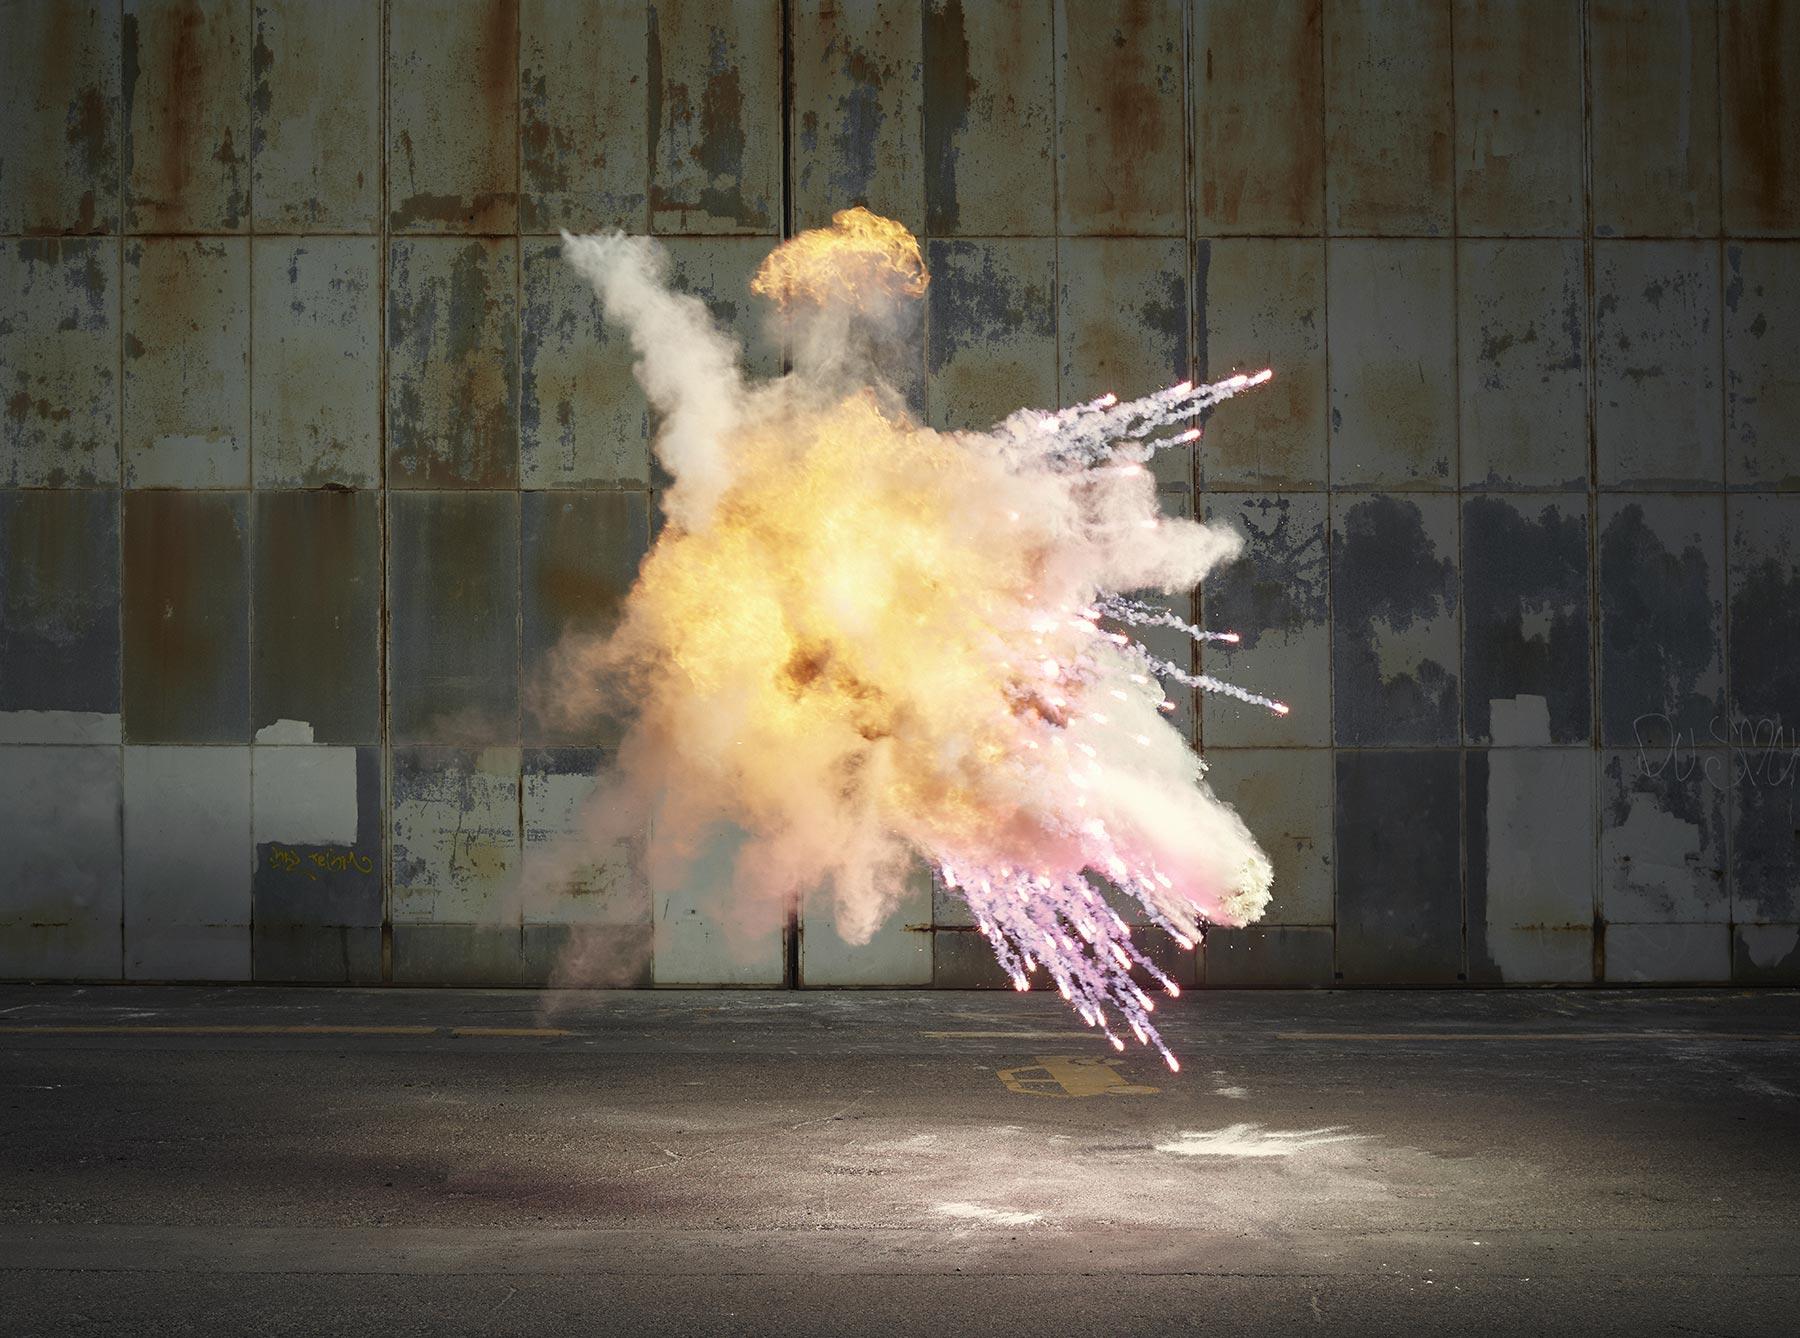 3explosion3.0